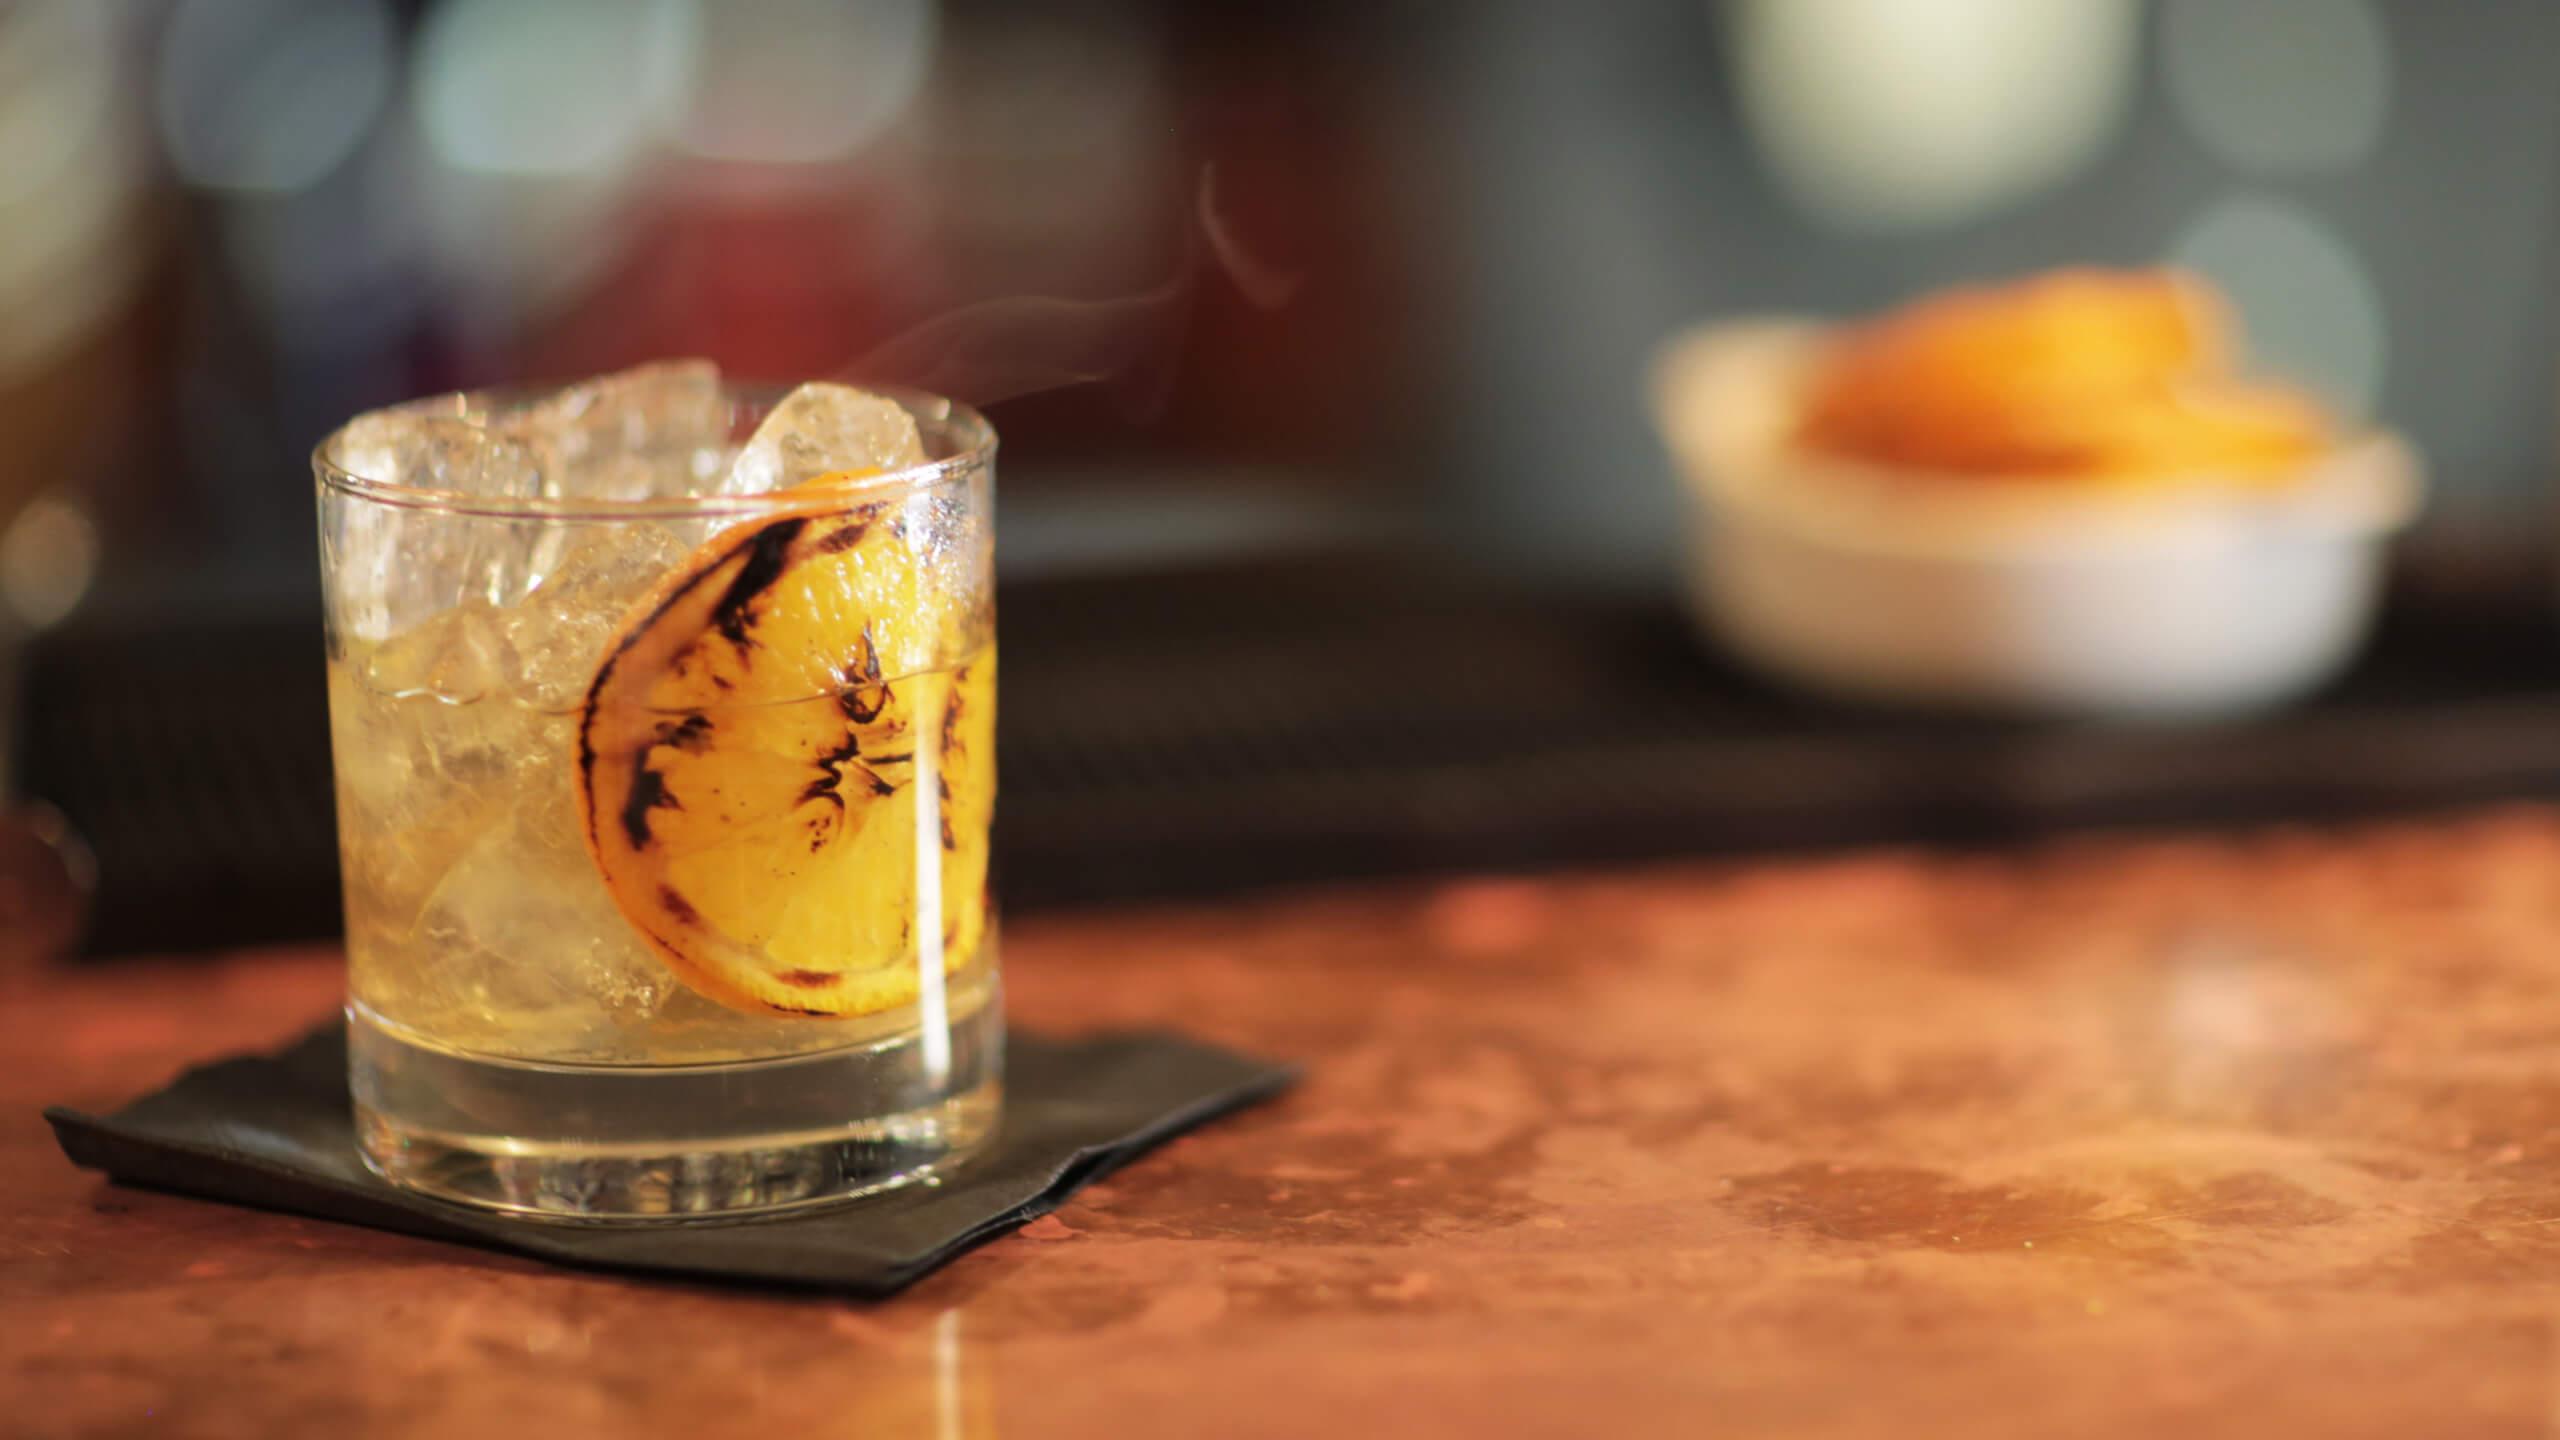 Maricastana (tequila, agave, tamarind, mole bitters and charred orange)